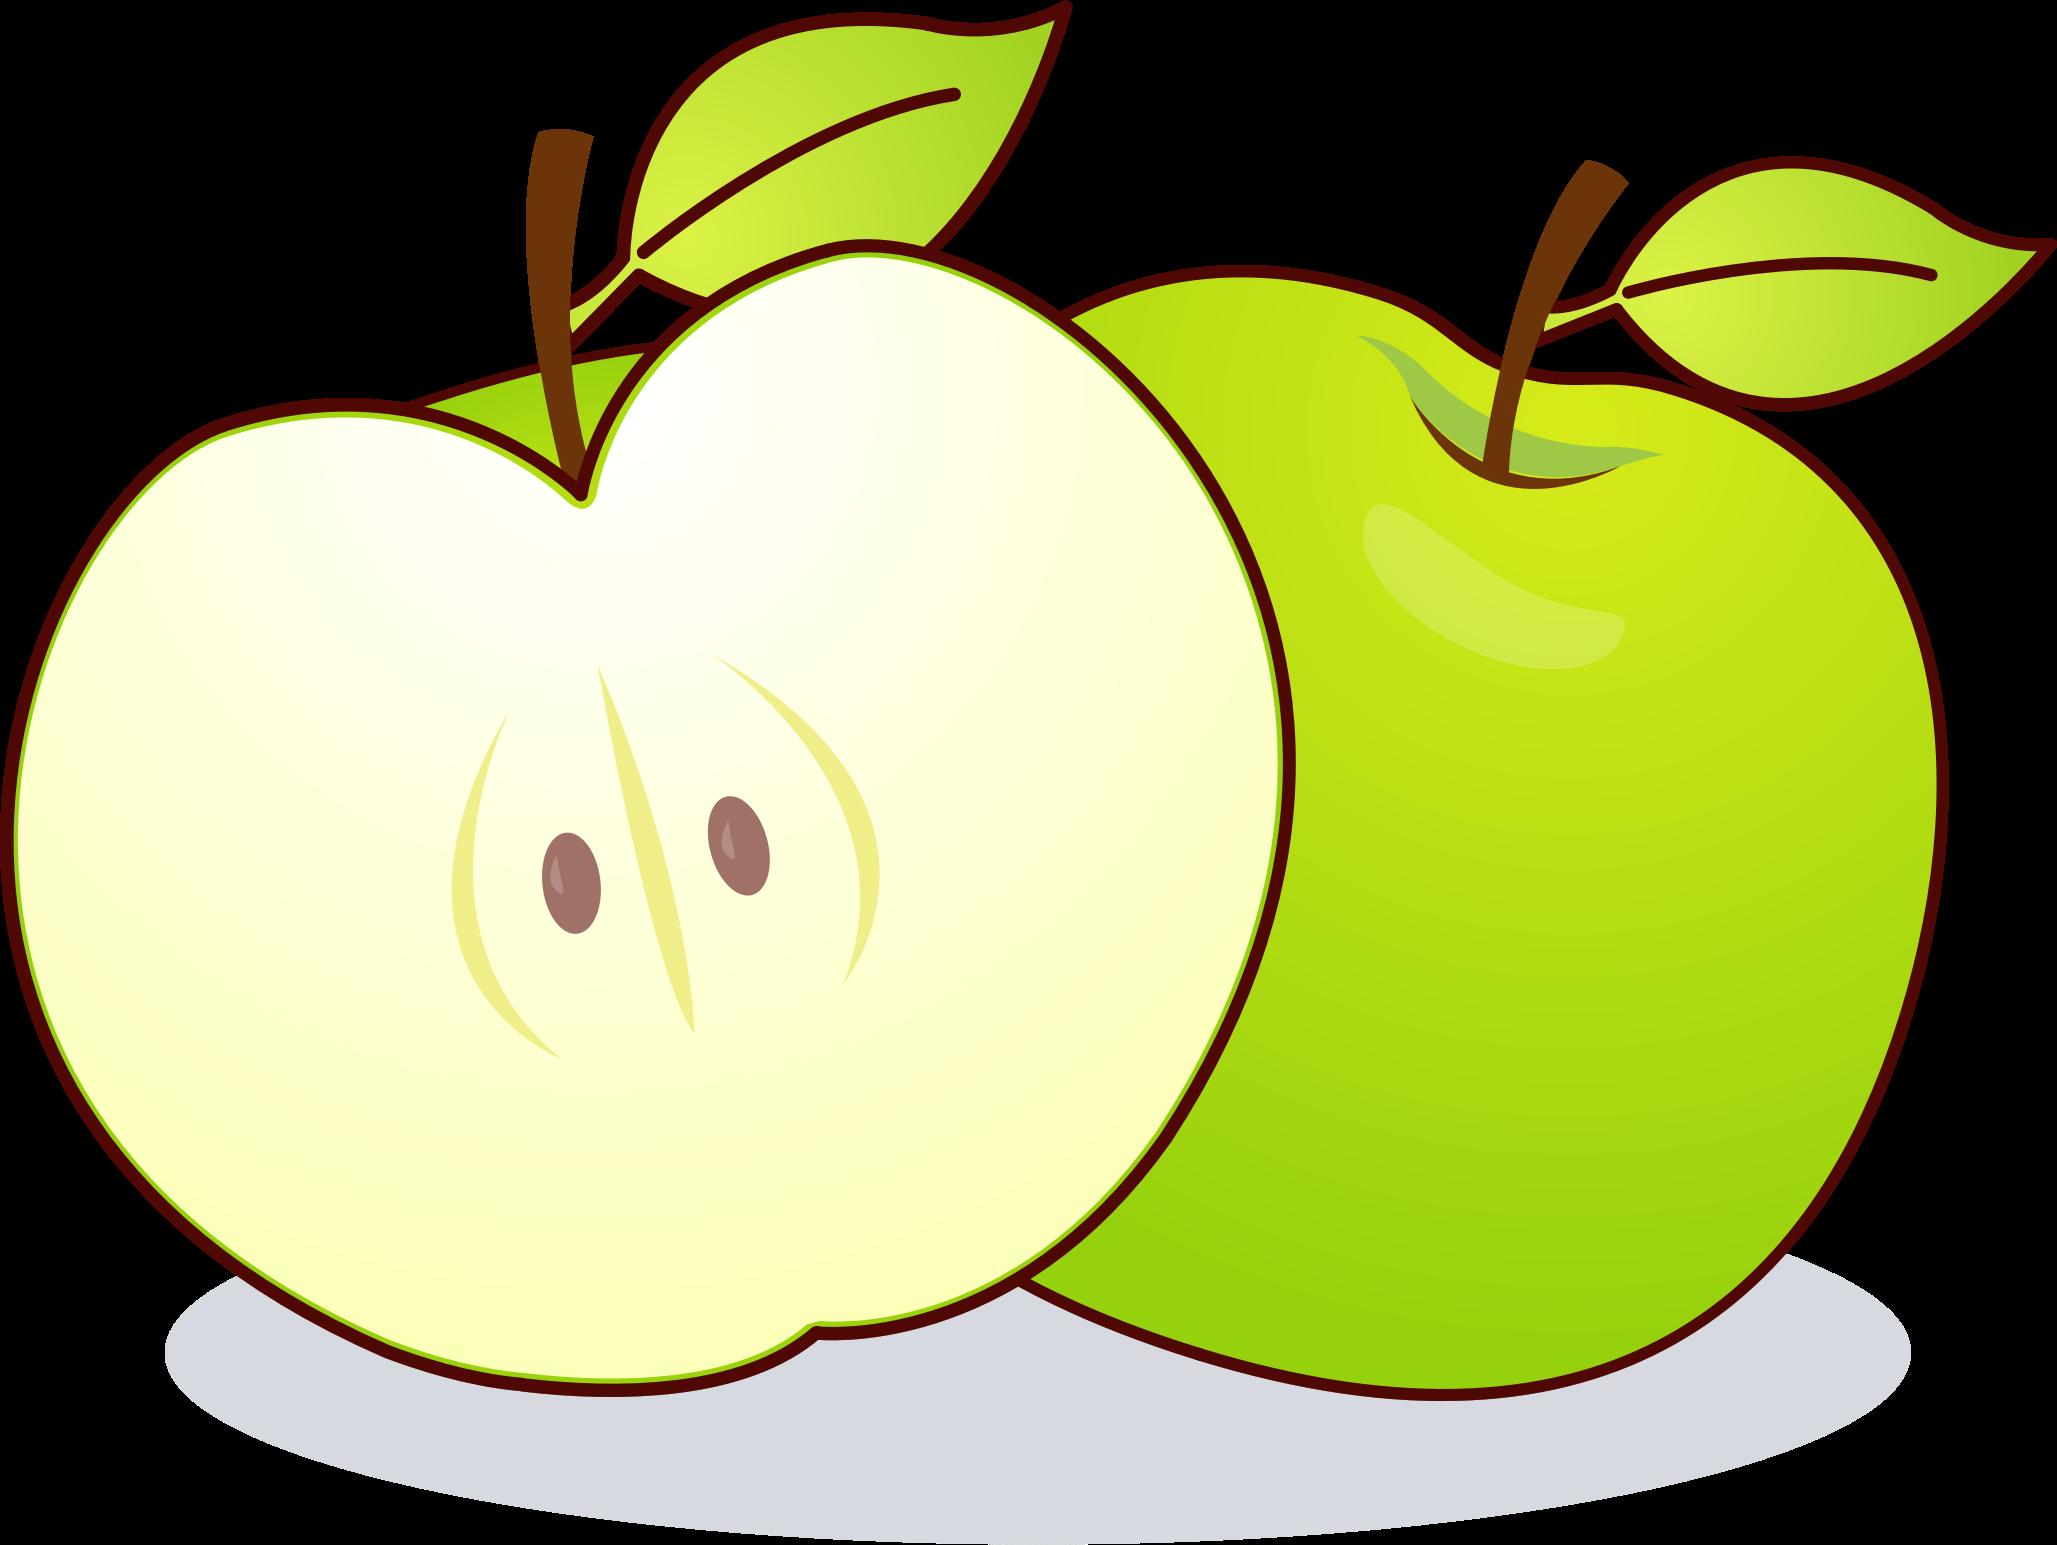 Apples clipart pdf. Apple big image png